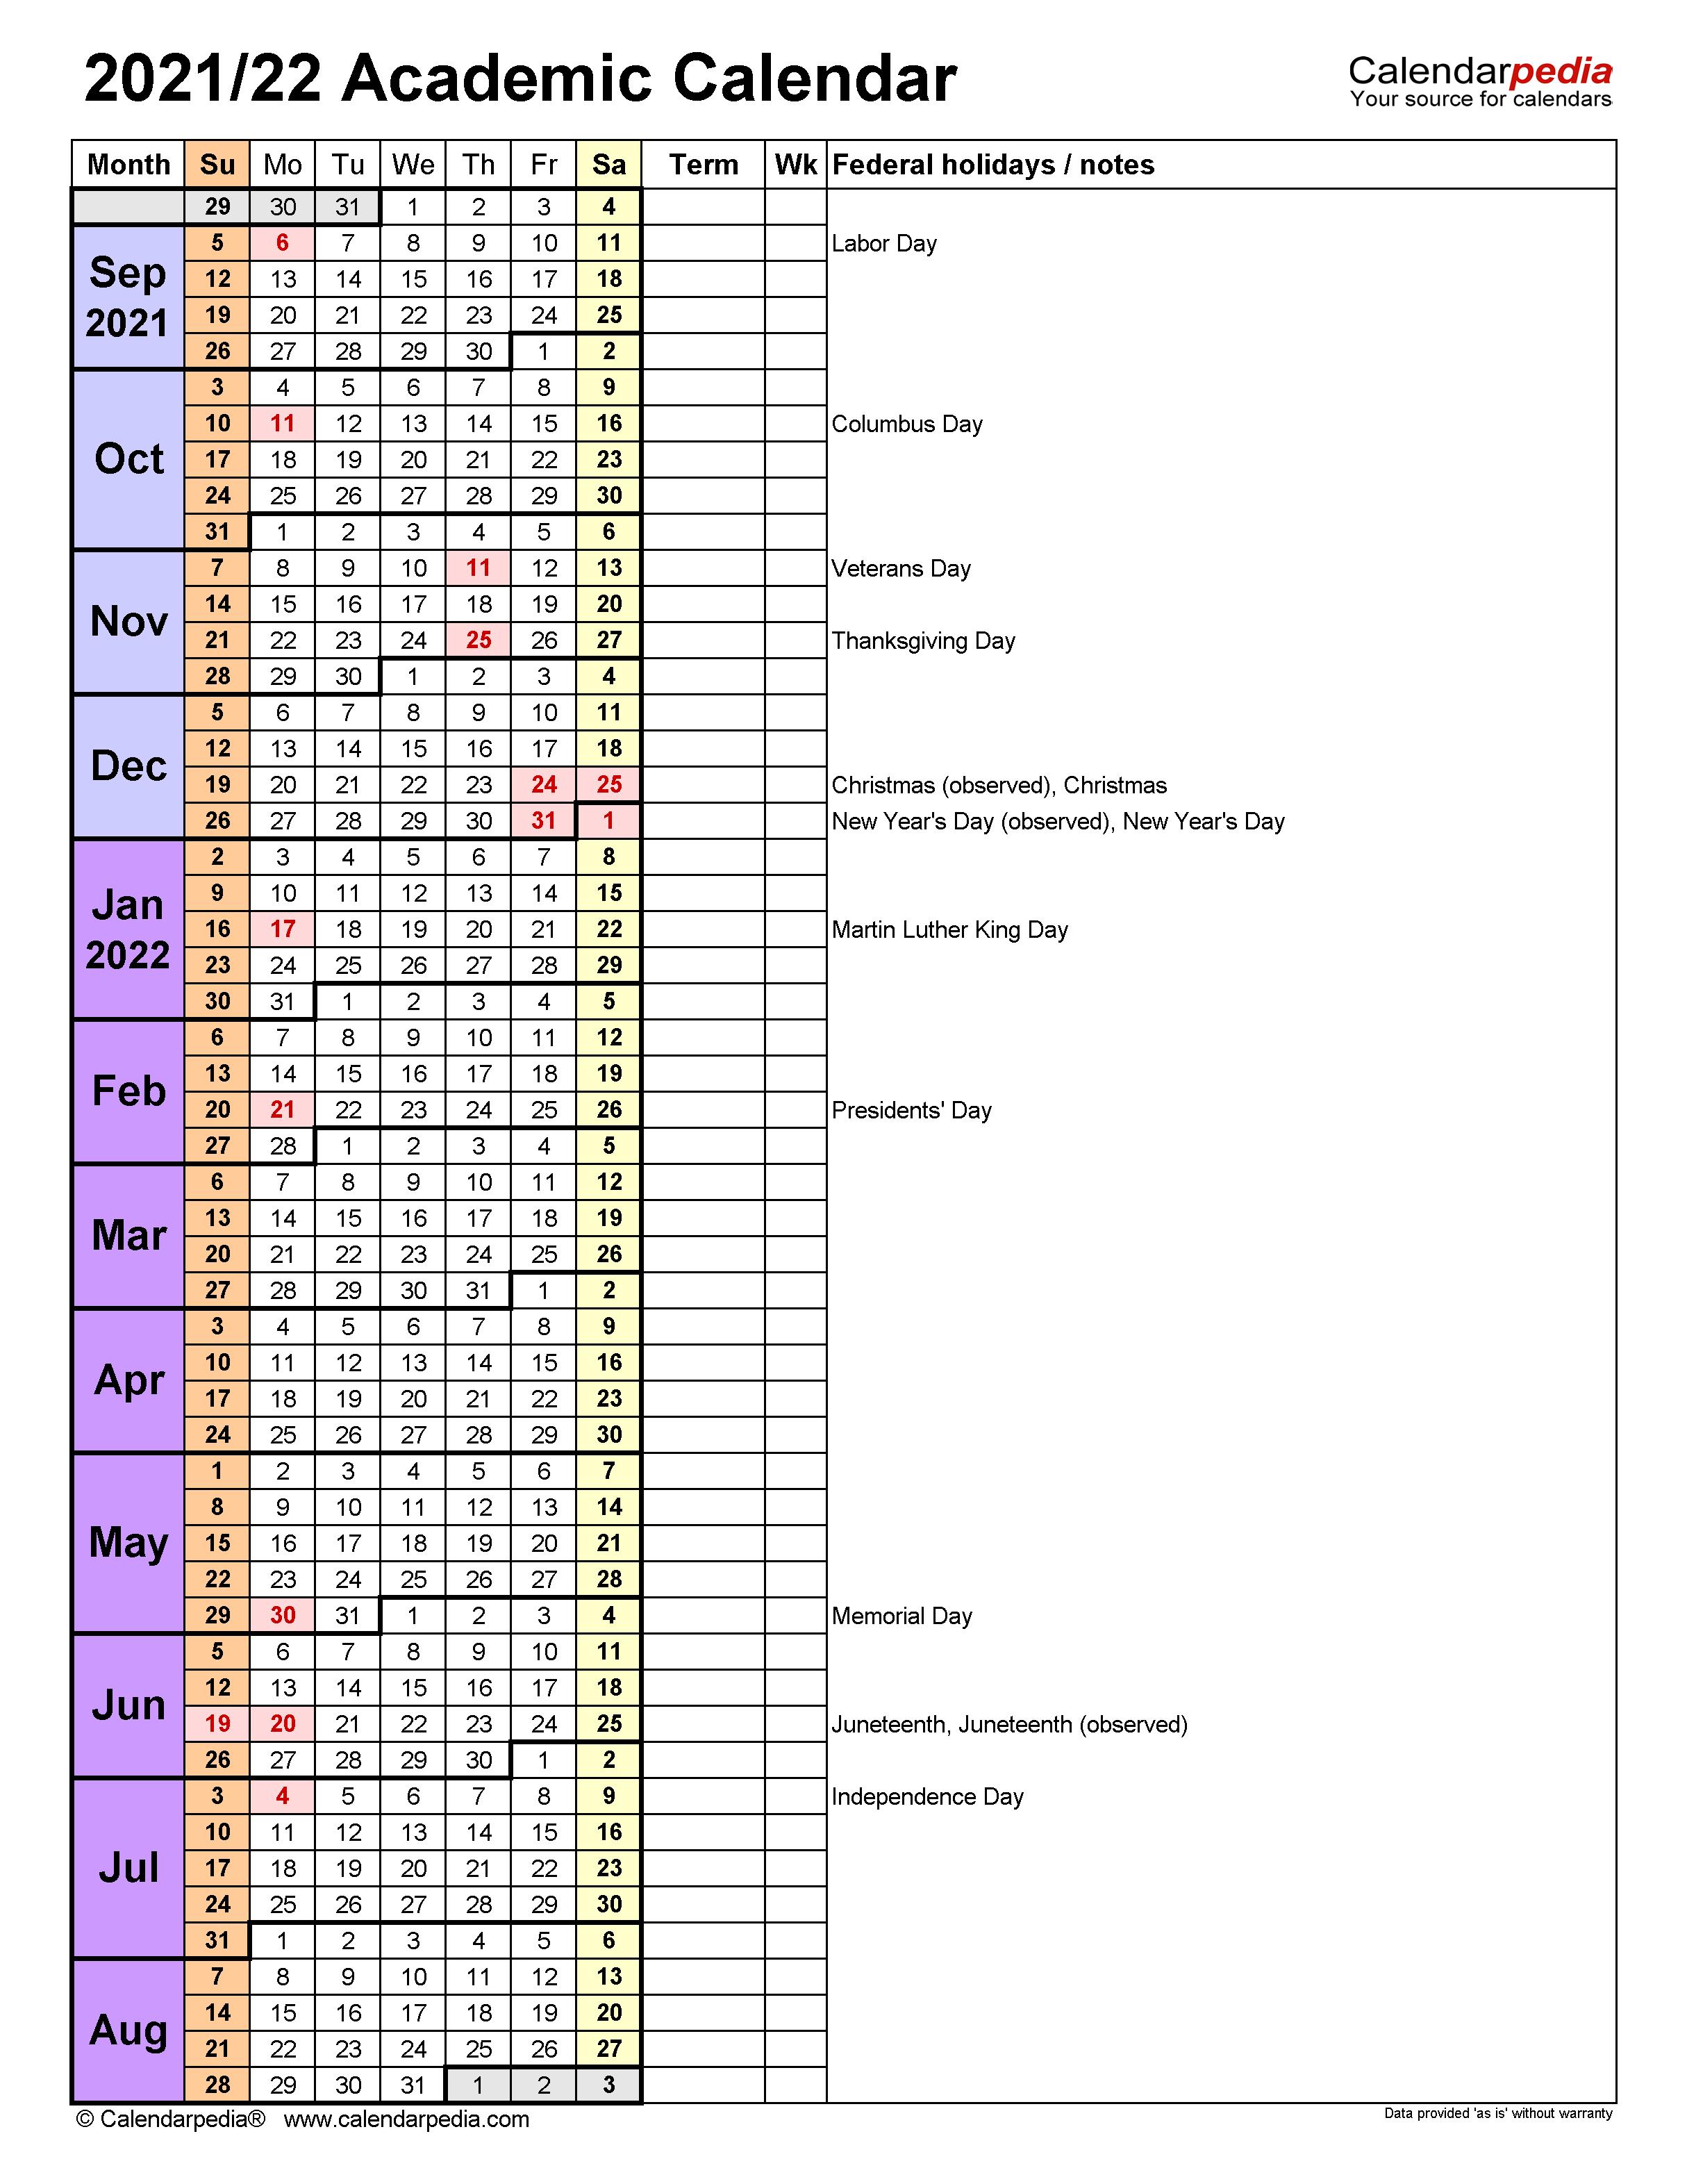 Miami University Calendar 2022 23.Academic Calendars 2021 2022 Free Printable Excel Templates